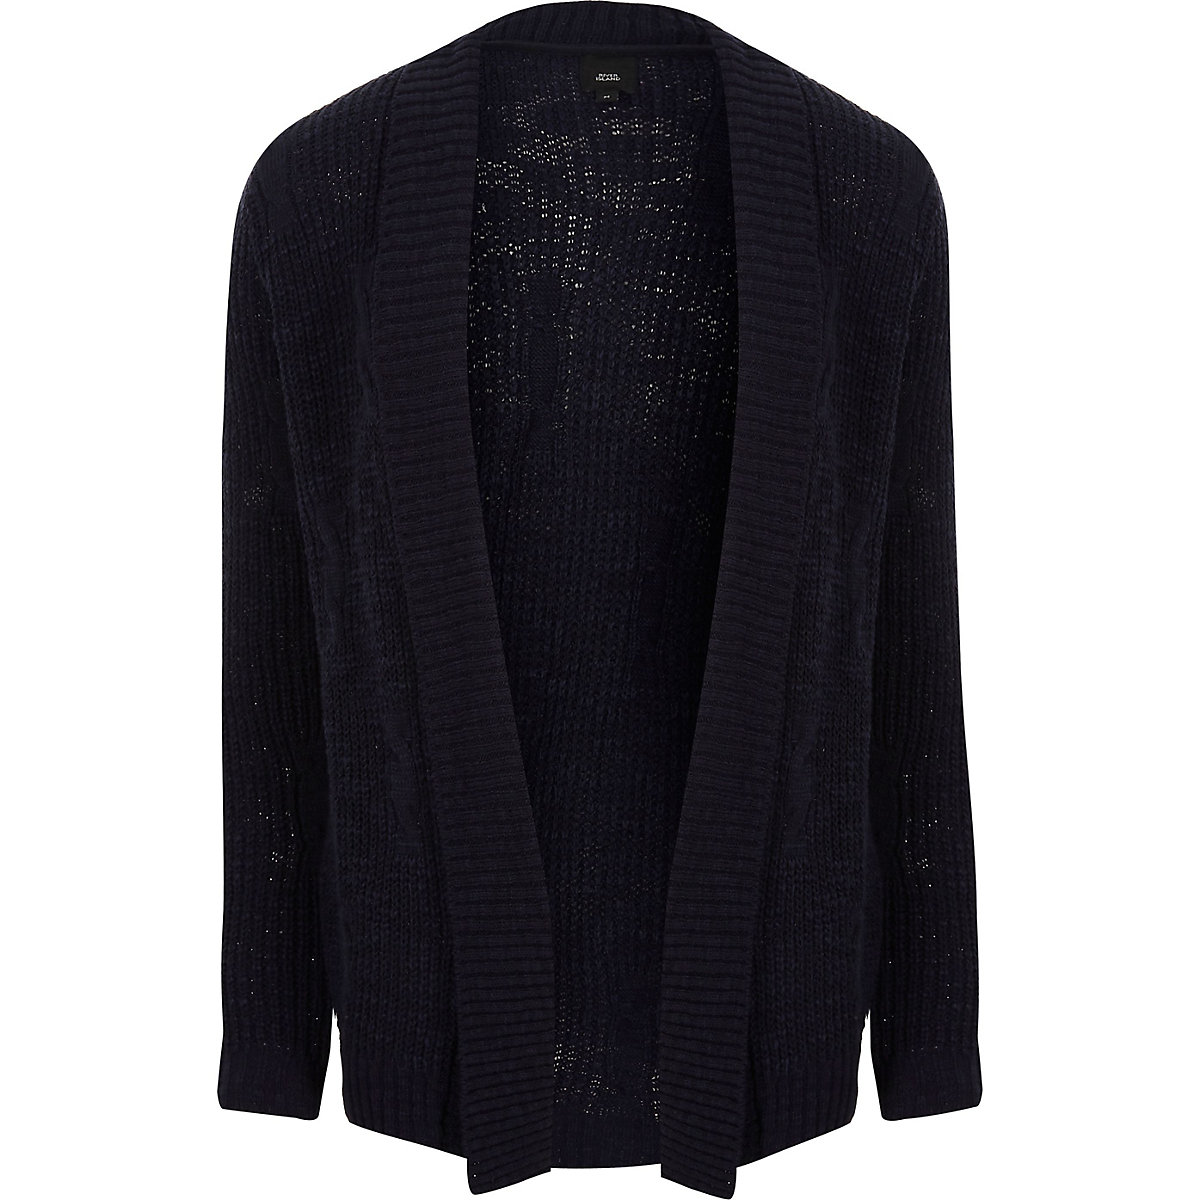 Navy rib cable knit slim fit cardigan